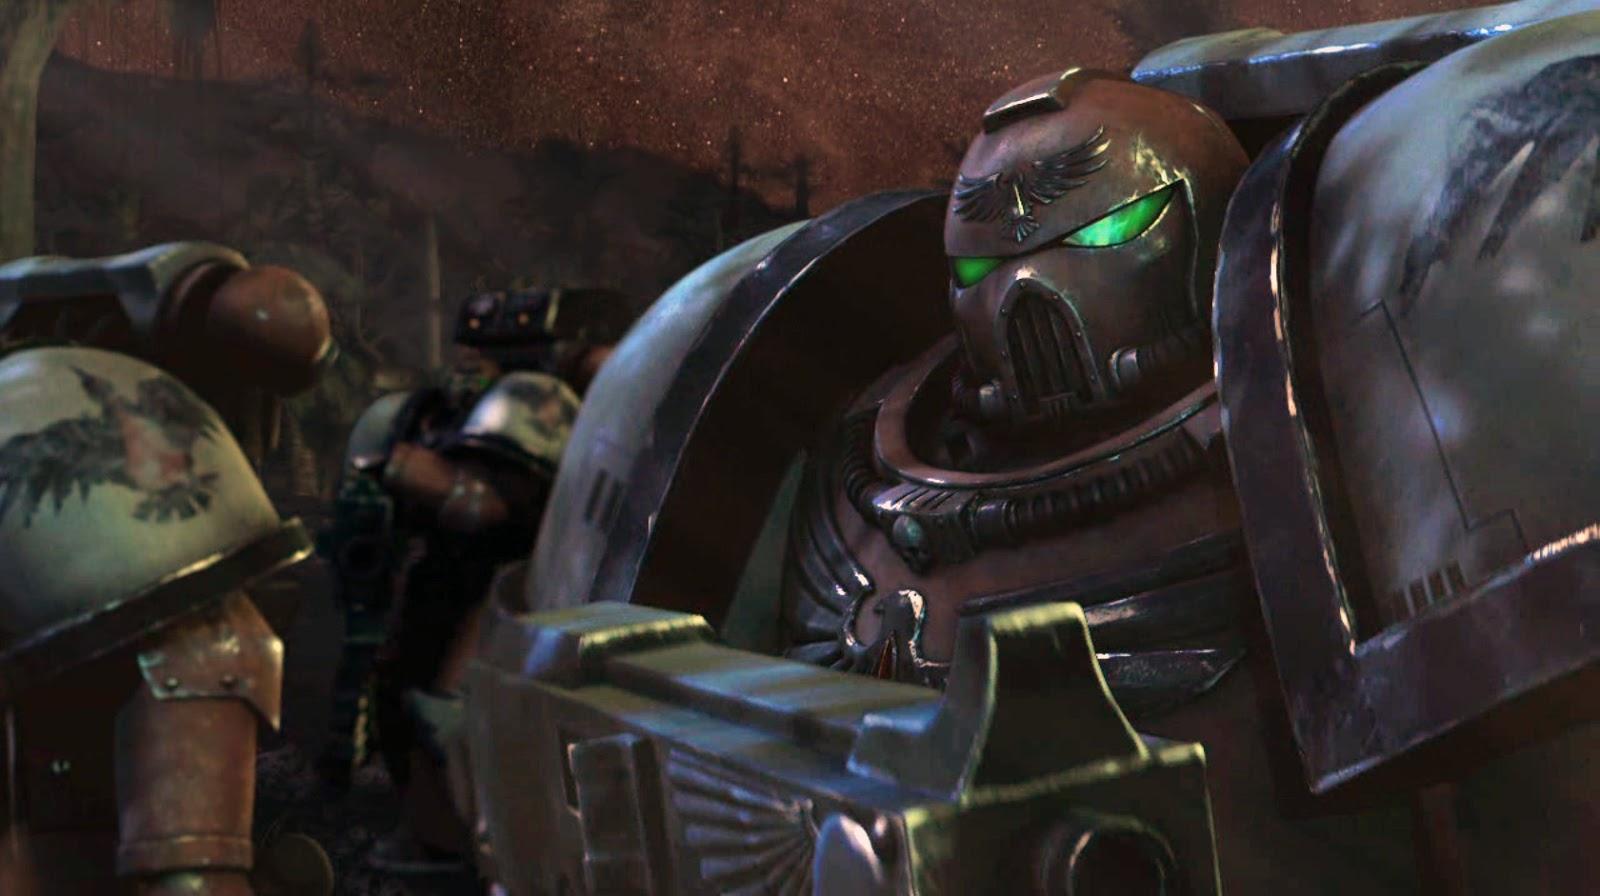 Warhammer 40k Space Marines: Faeit 212: Warhammer 40k News And Rumors